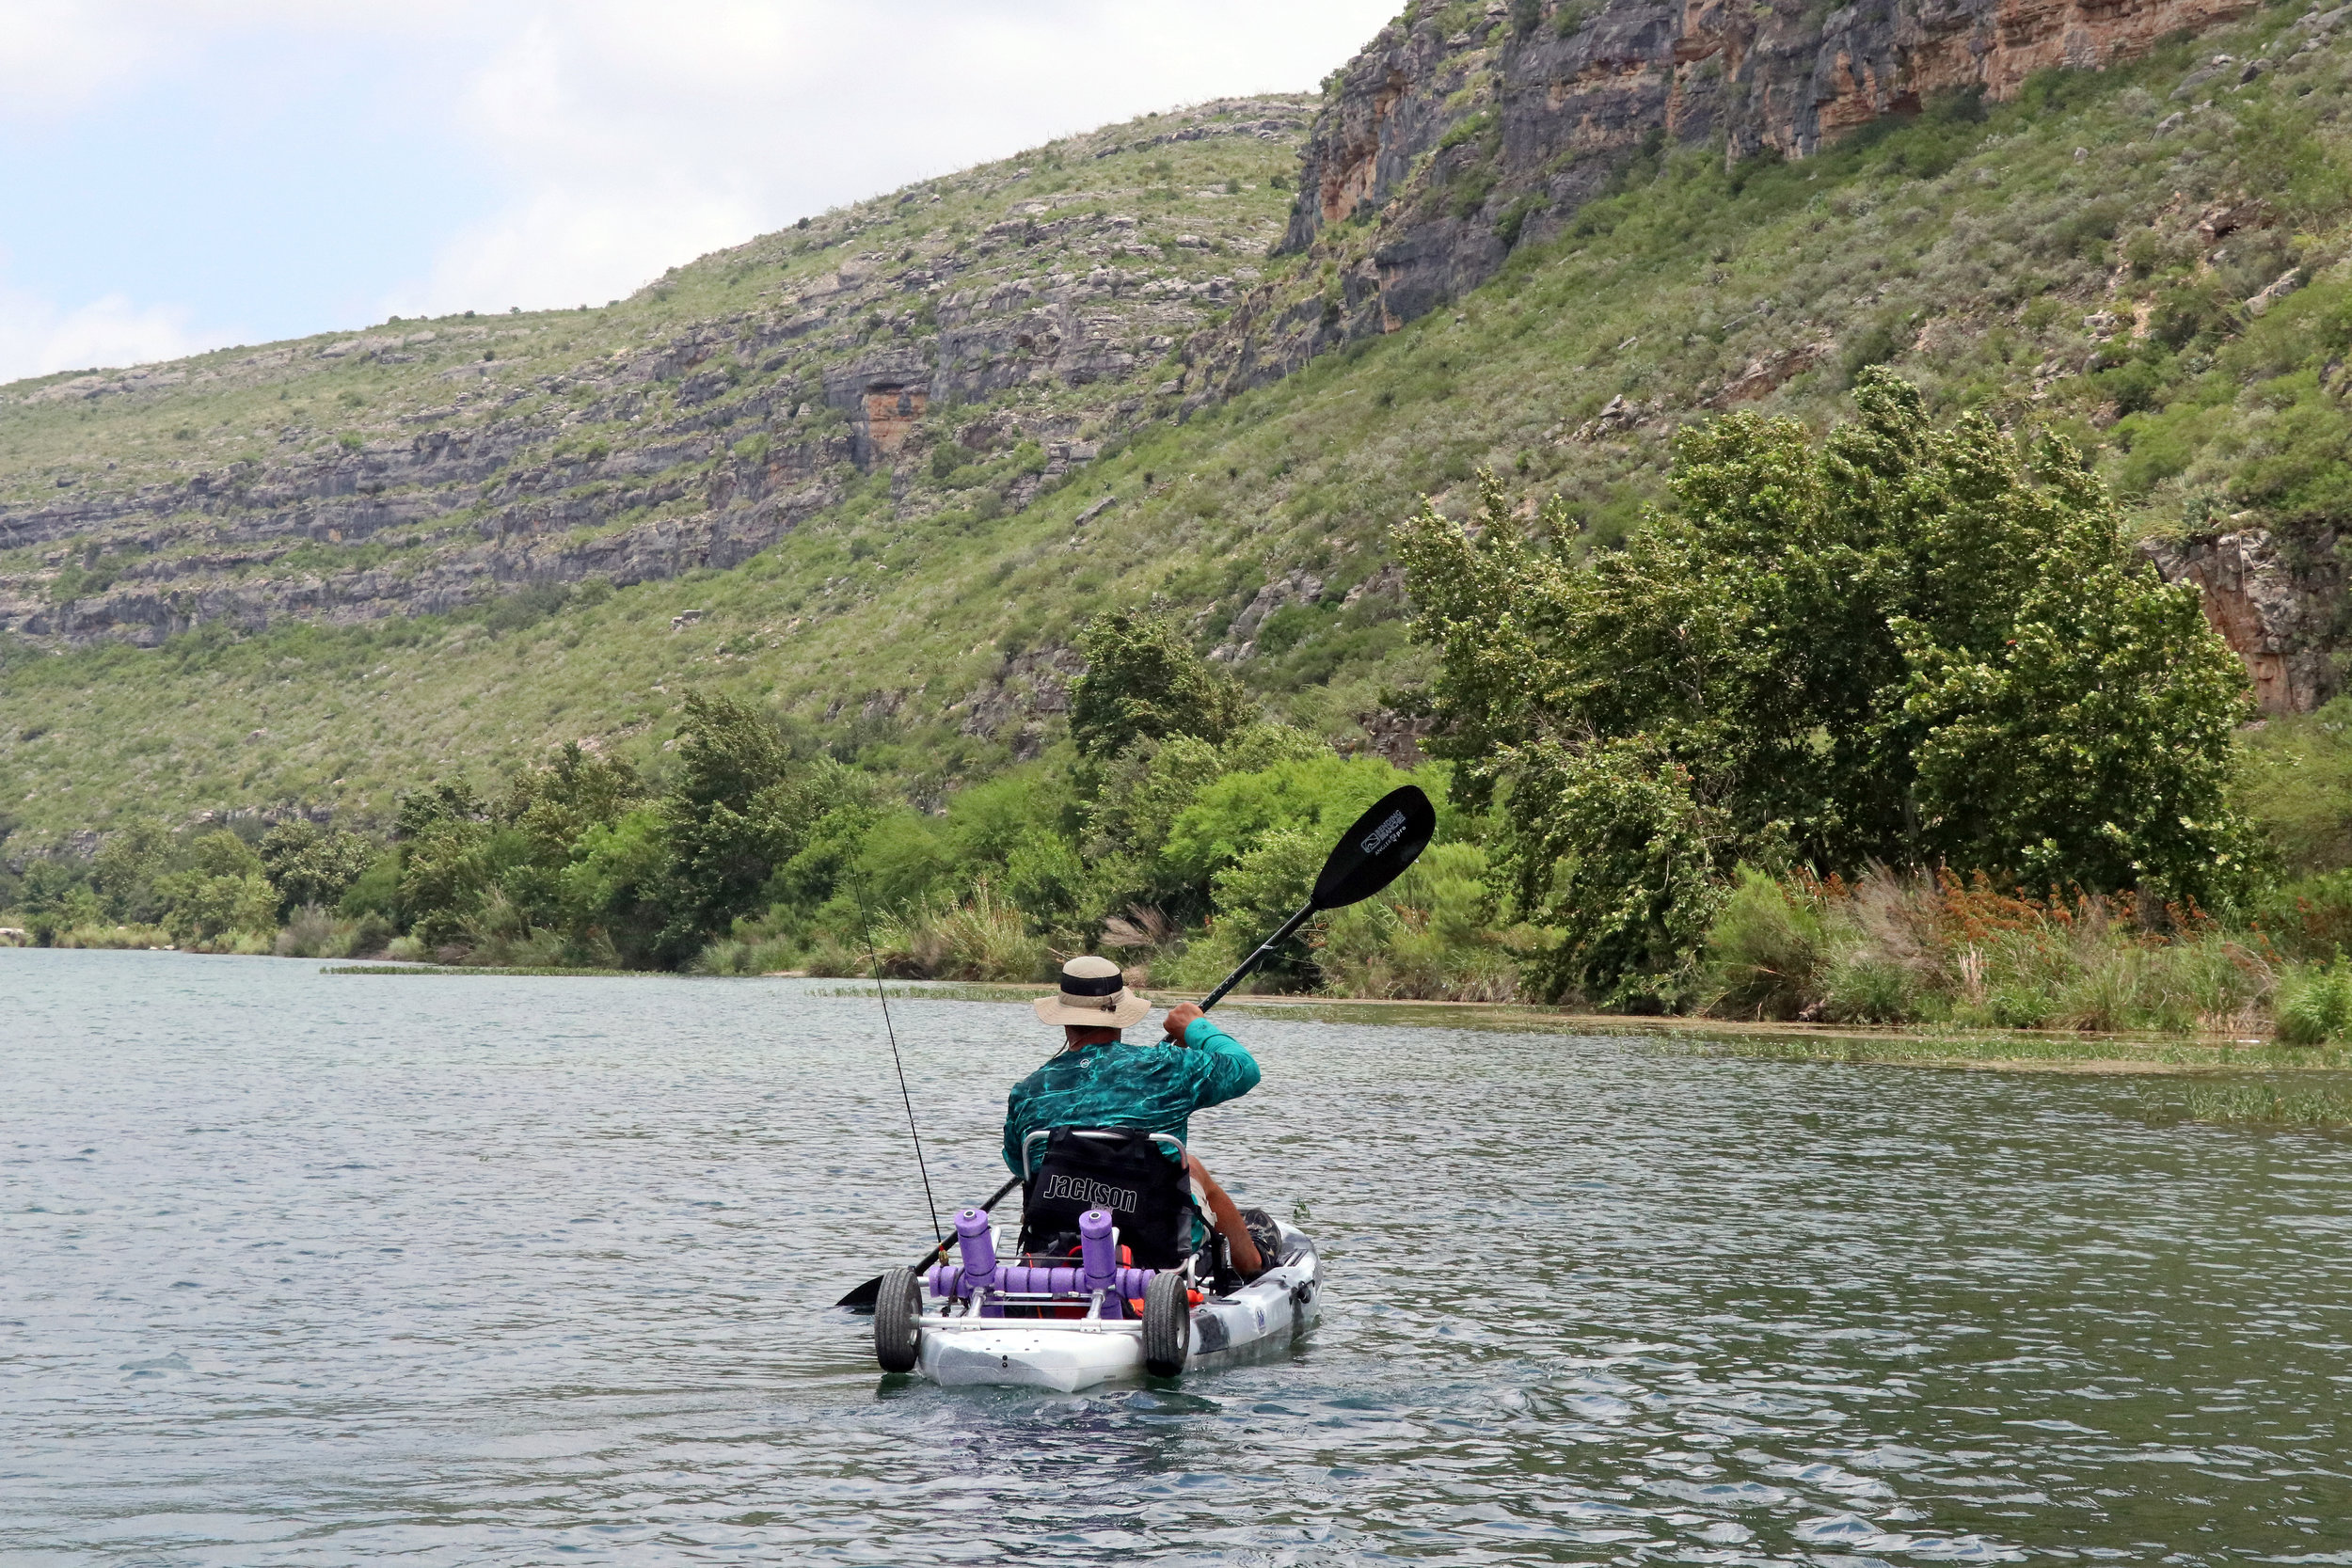 Jackson Kayak Liska Bending Branches Angler Pro Carbon